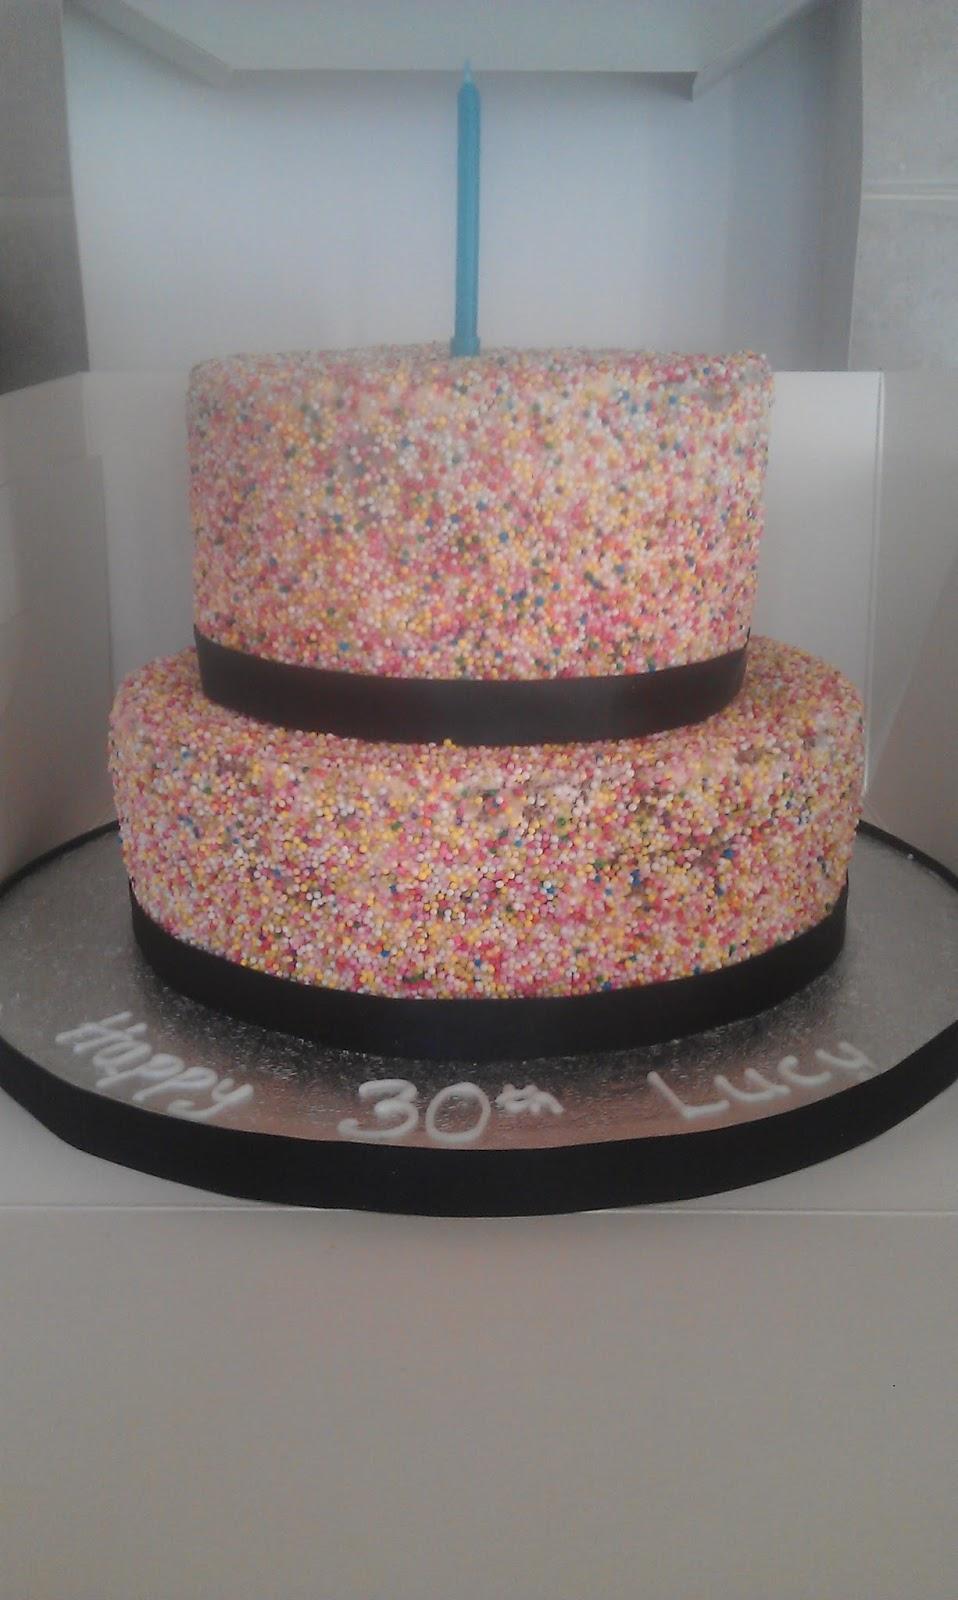 Custom Cake Designs Uk : Custom Cake Design: August 2013